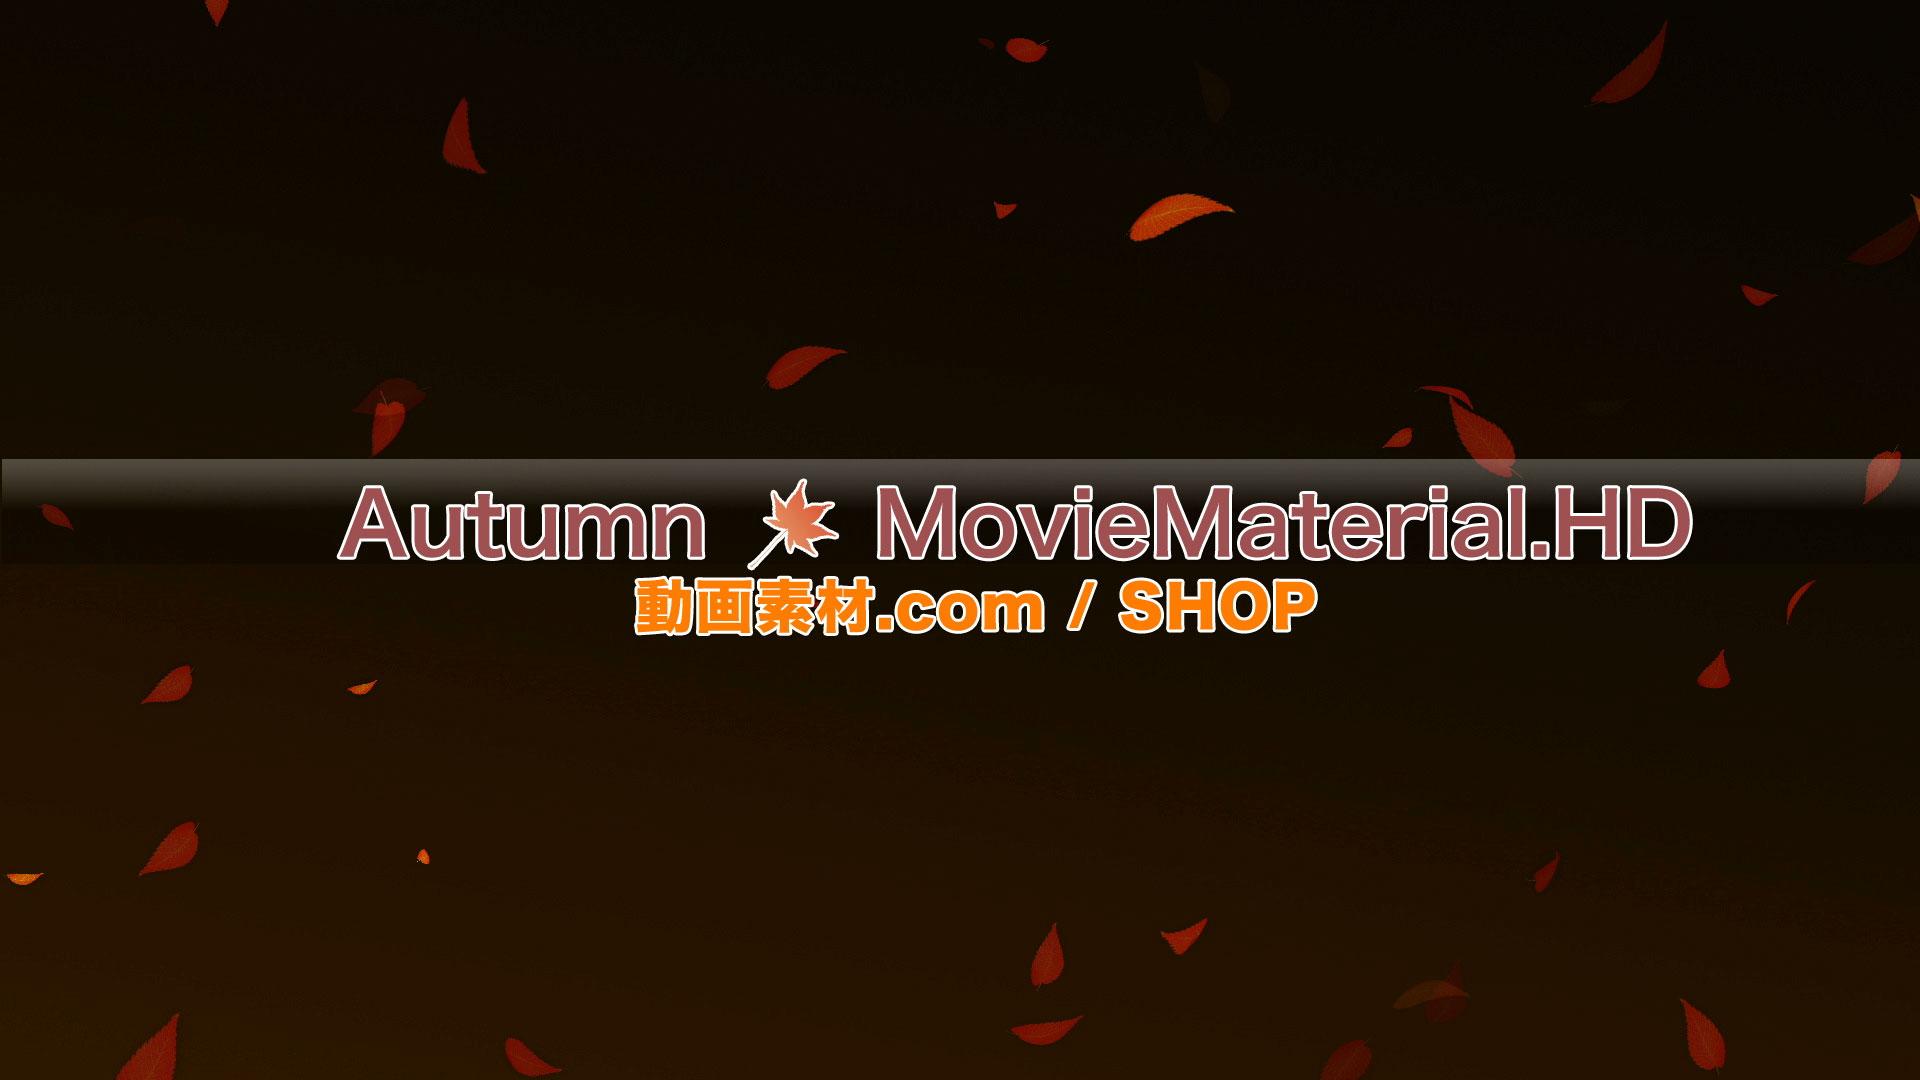 【Autumn MovieMaterial.HD】ハイビジョン 秋を題材にした実写映像素材とCG動画素材_image3